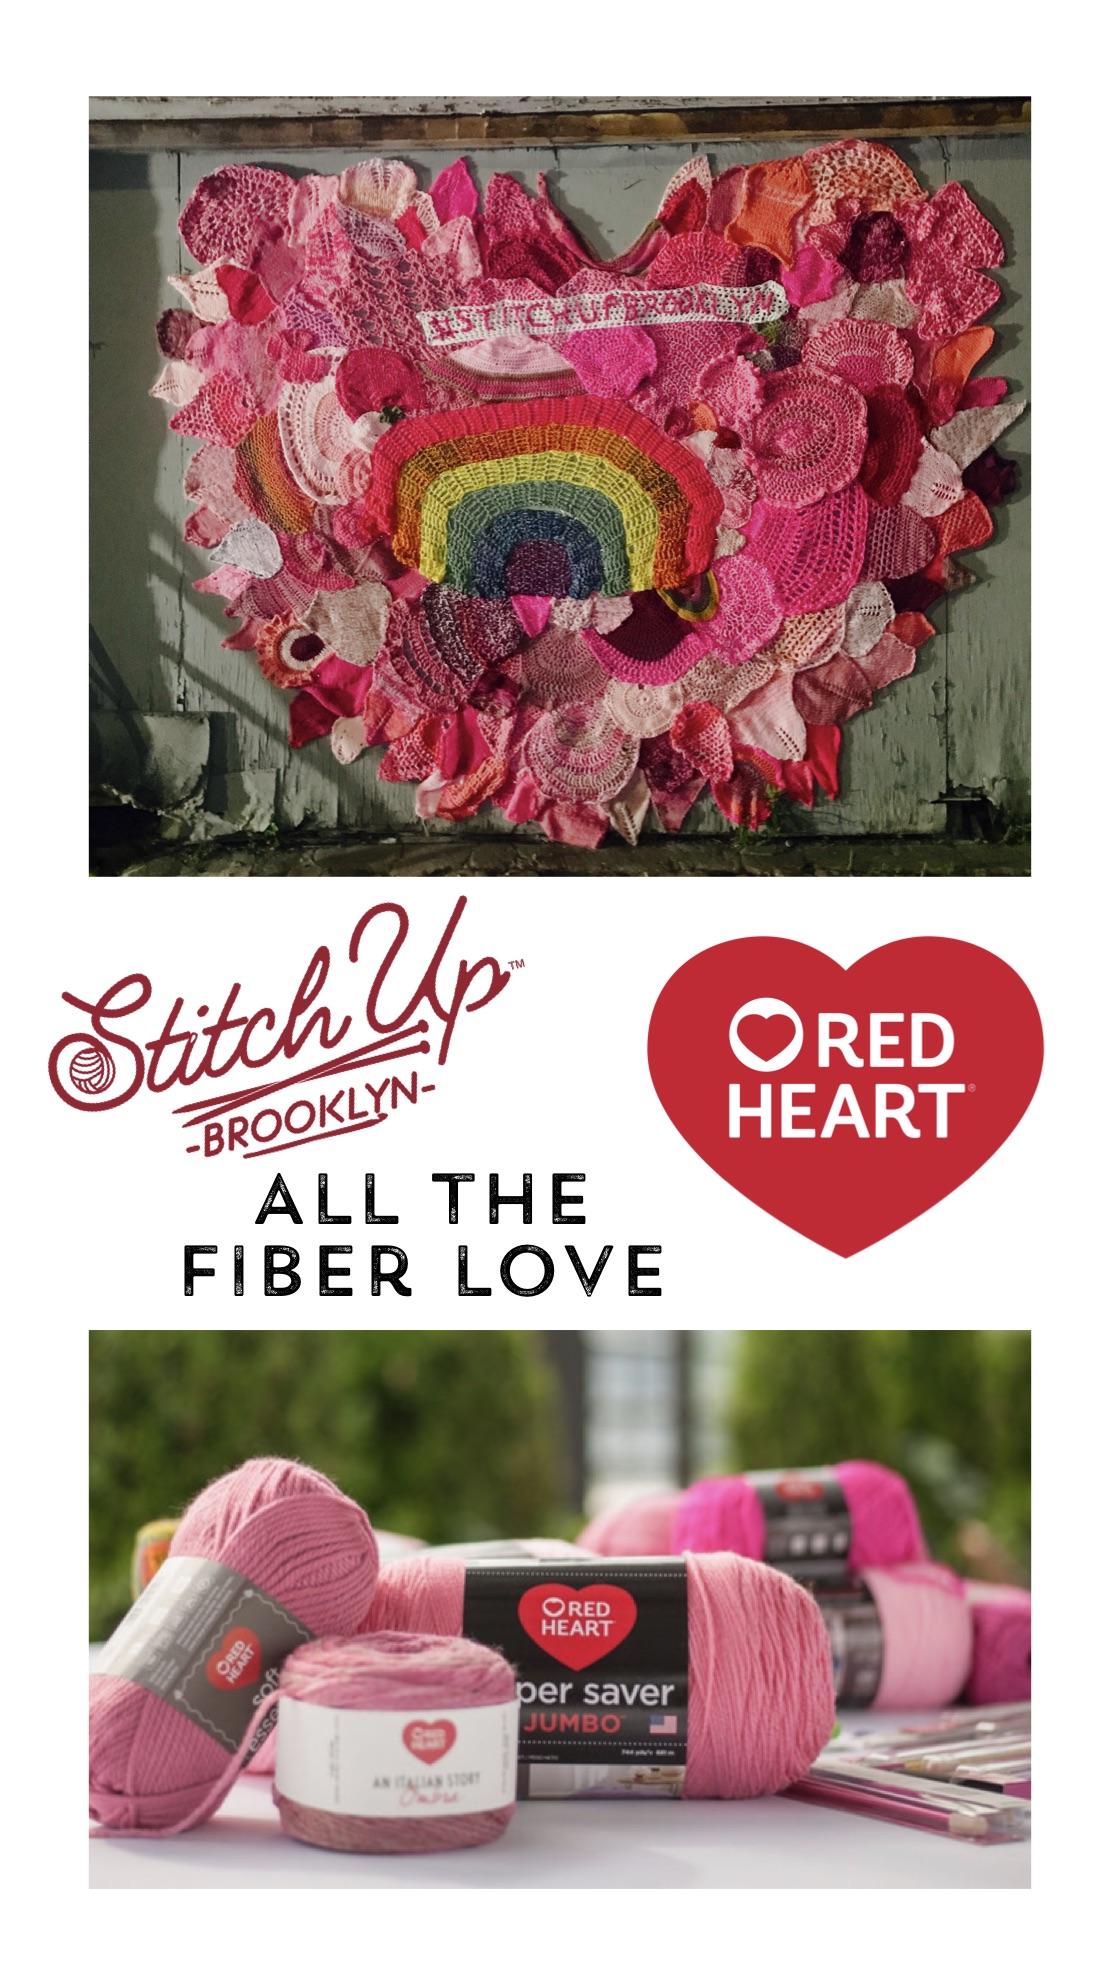 RedHeart-stitchupbrooklyn-2019-post-2.jpg